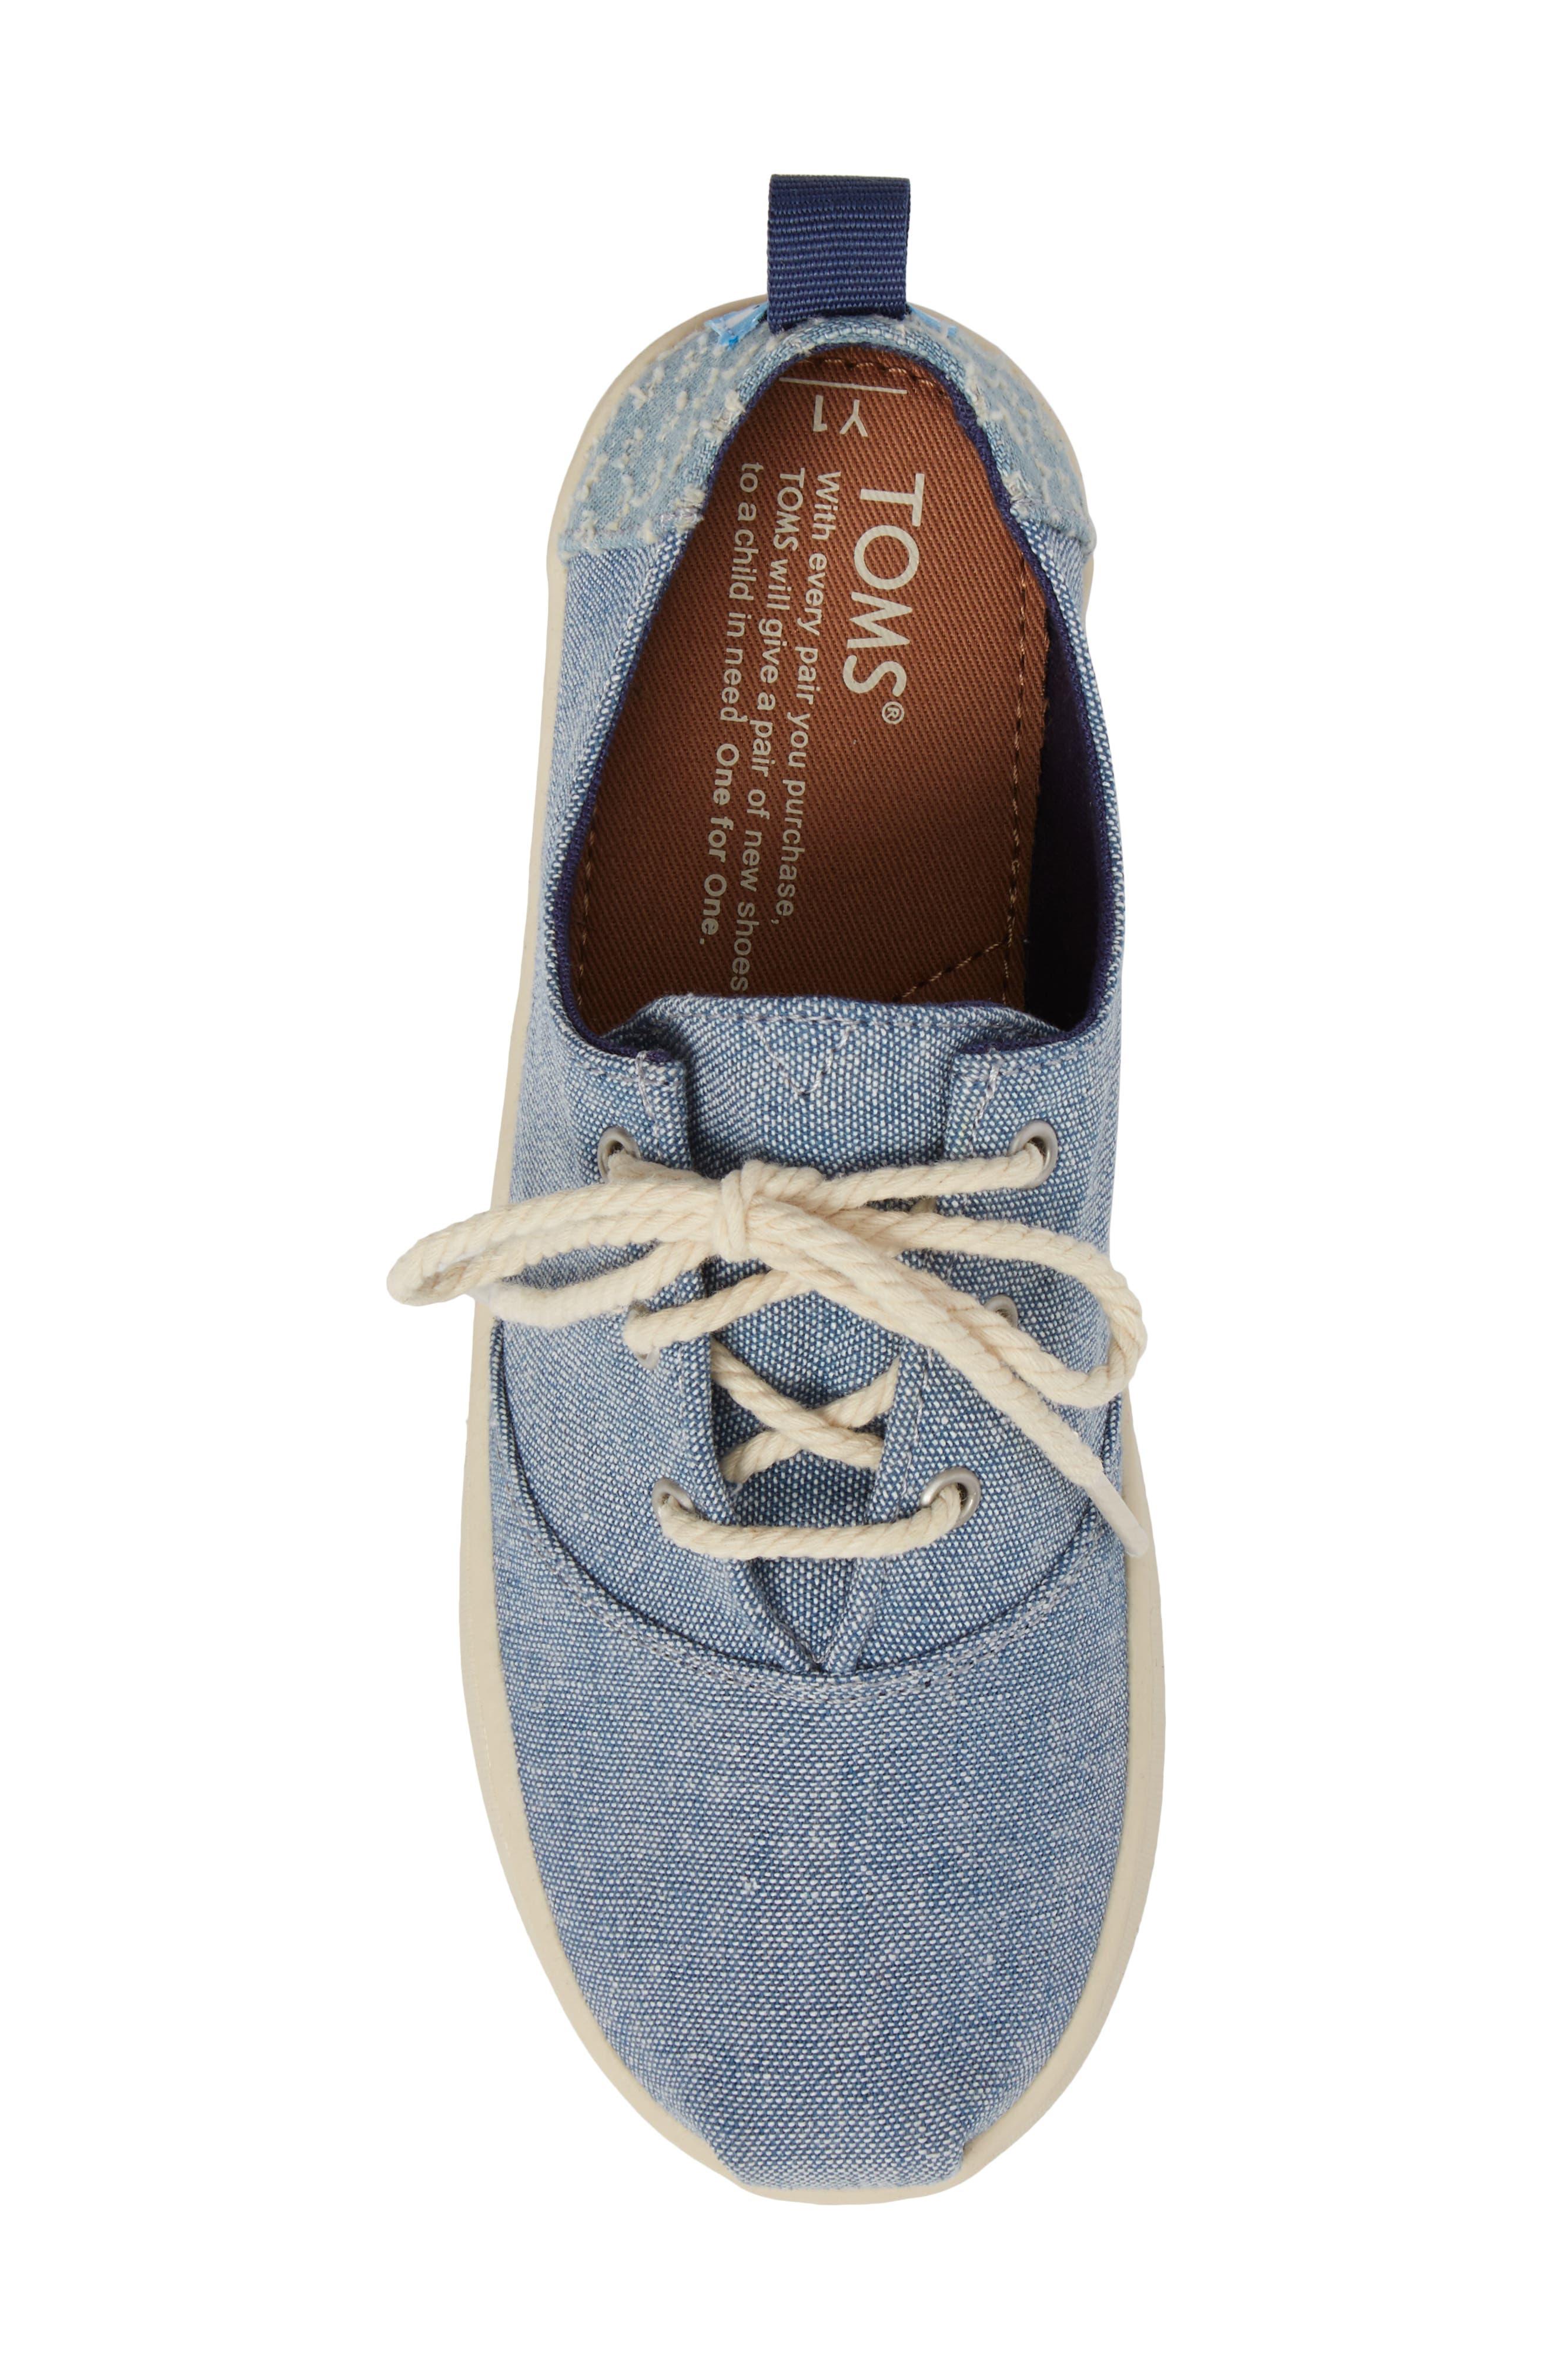 Lumin Sneaker,                             Alternate thumbnail 5, color,                             Blue Chambray